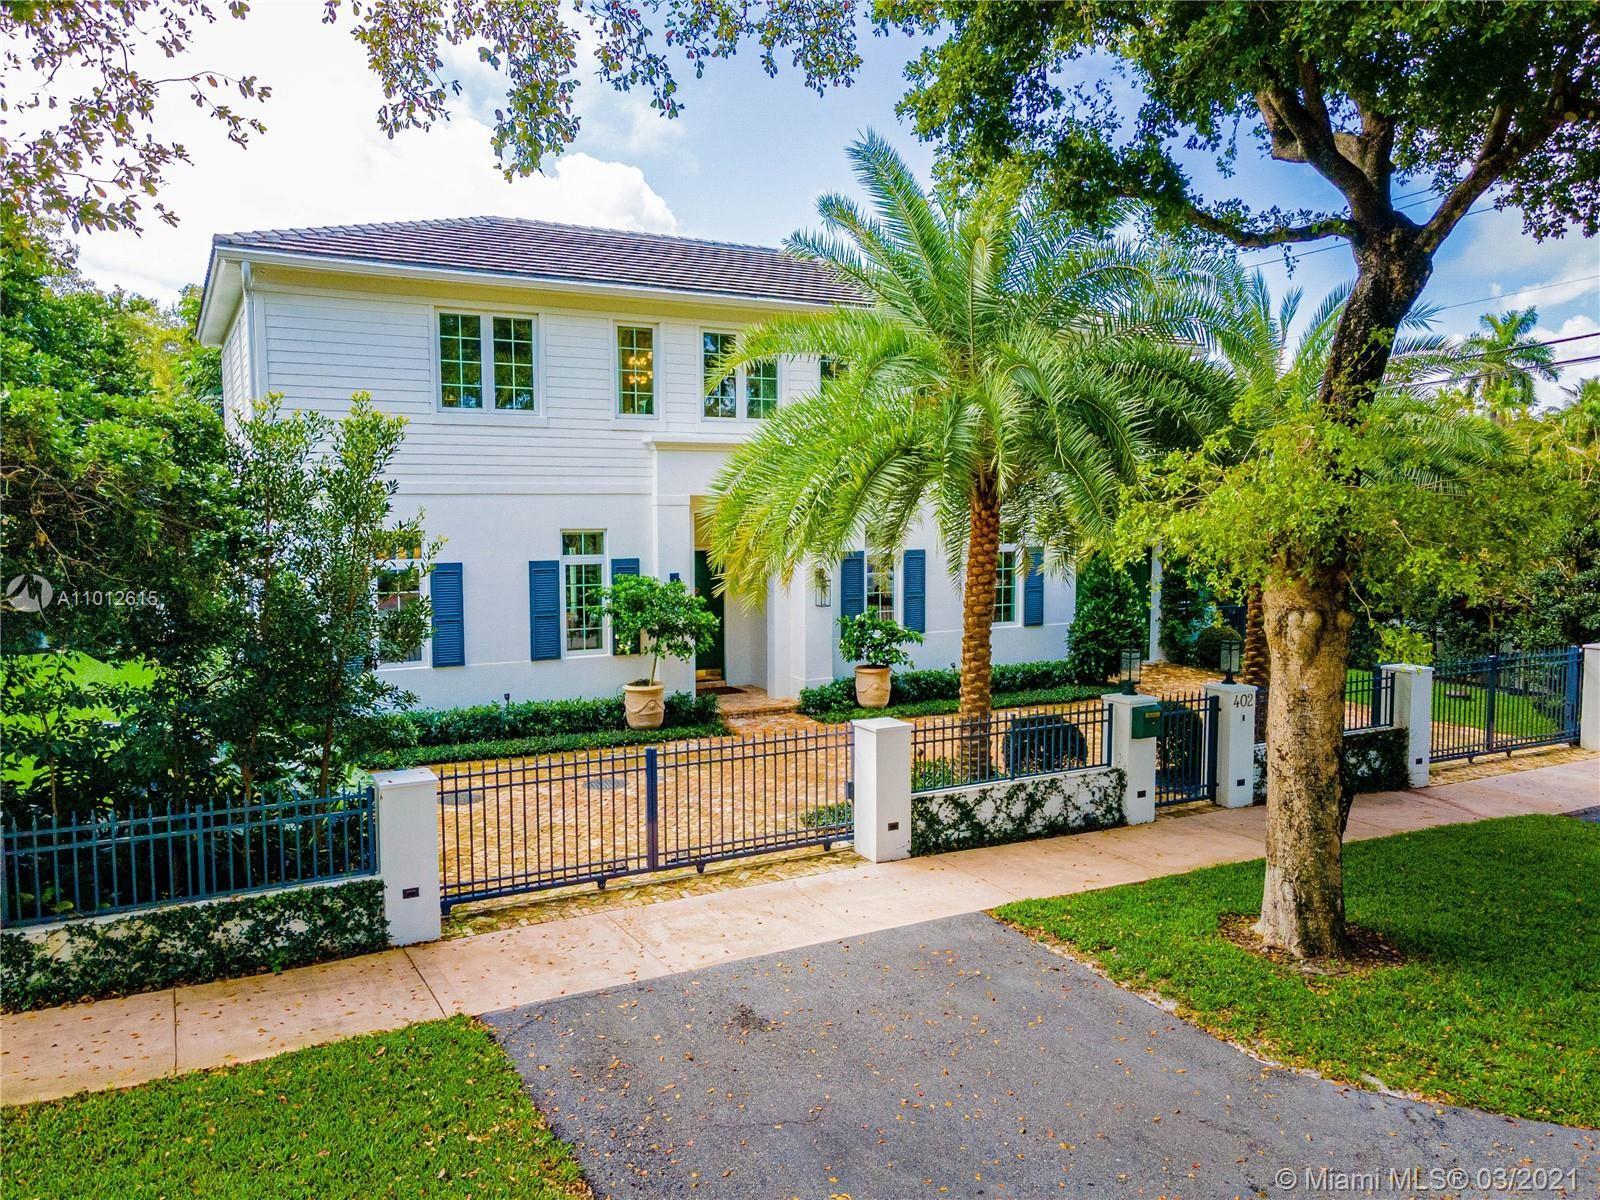 402 Vittorio Ave, Coral Gables, FL 33146 - #: A11012615